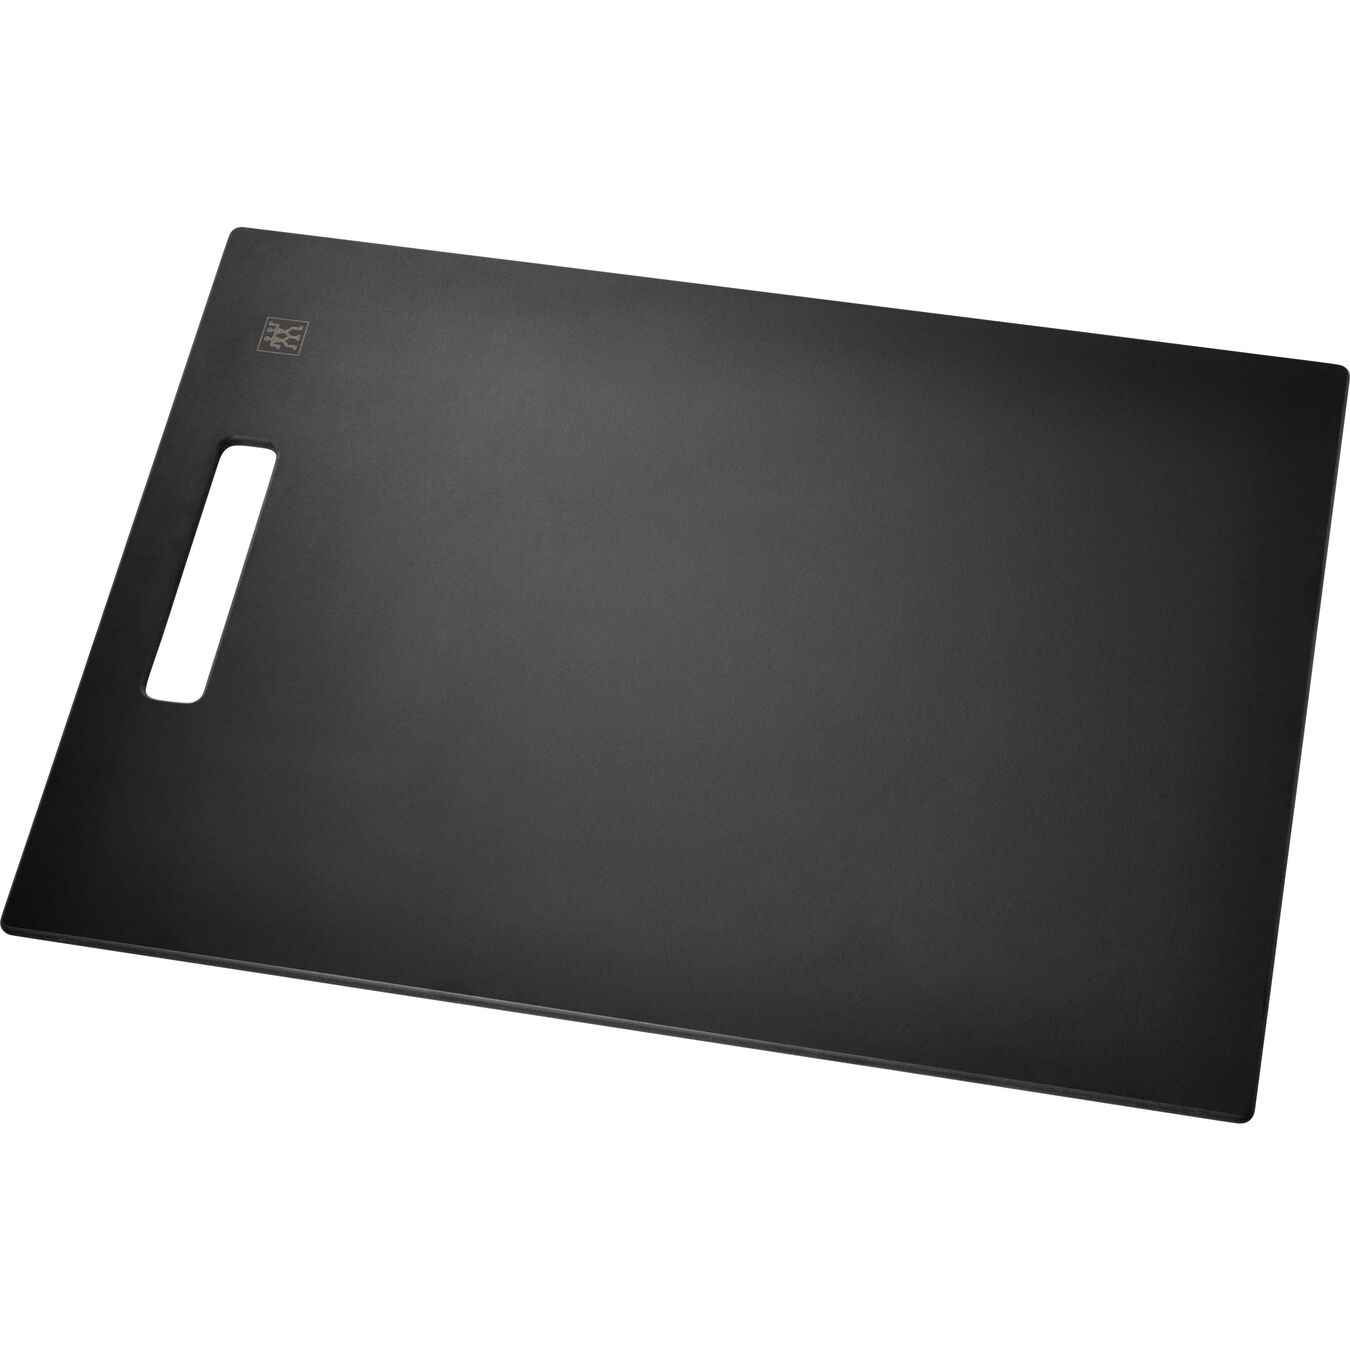 Cutting board 45 cm x 33 cm Fibre wood,,large 1